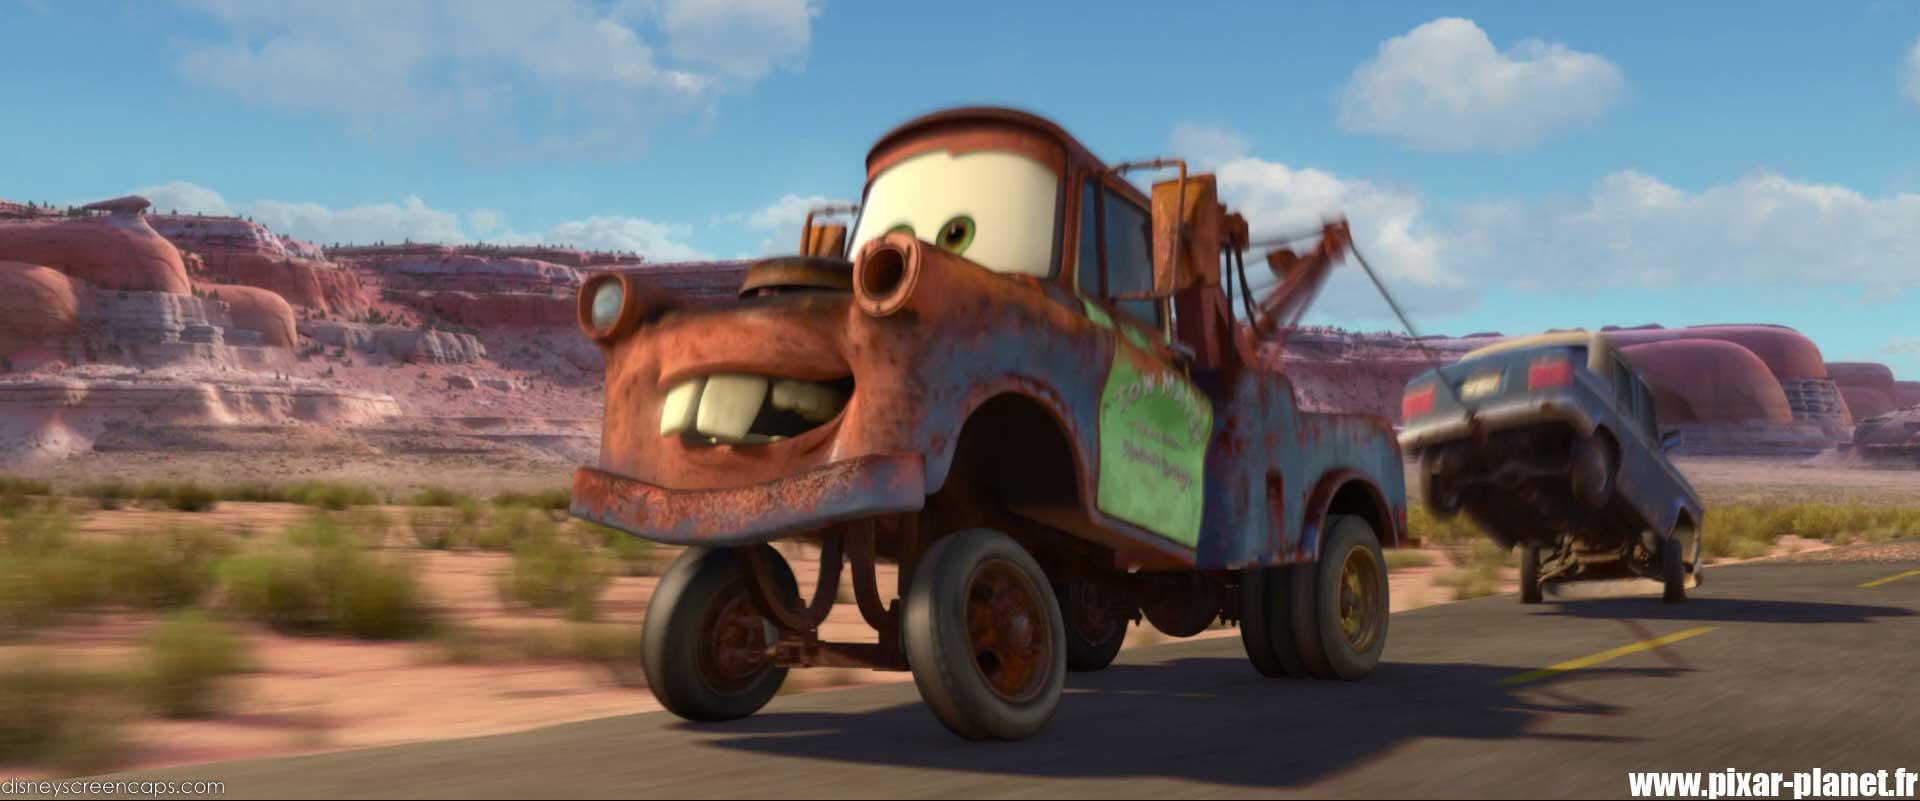 Mater Cars Wallpaper Les R 233 Pliques Dans Cars 2 Pixar Planet Fr